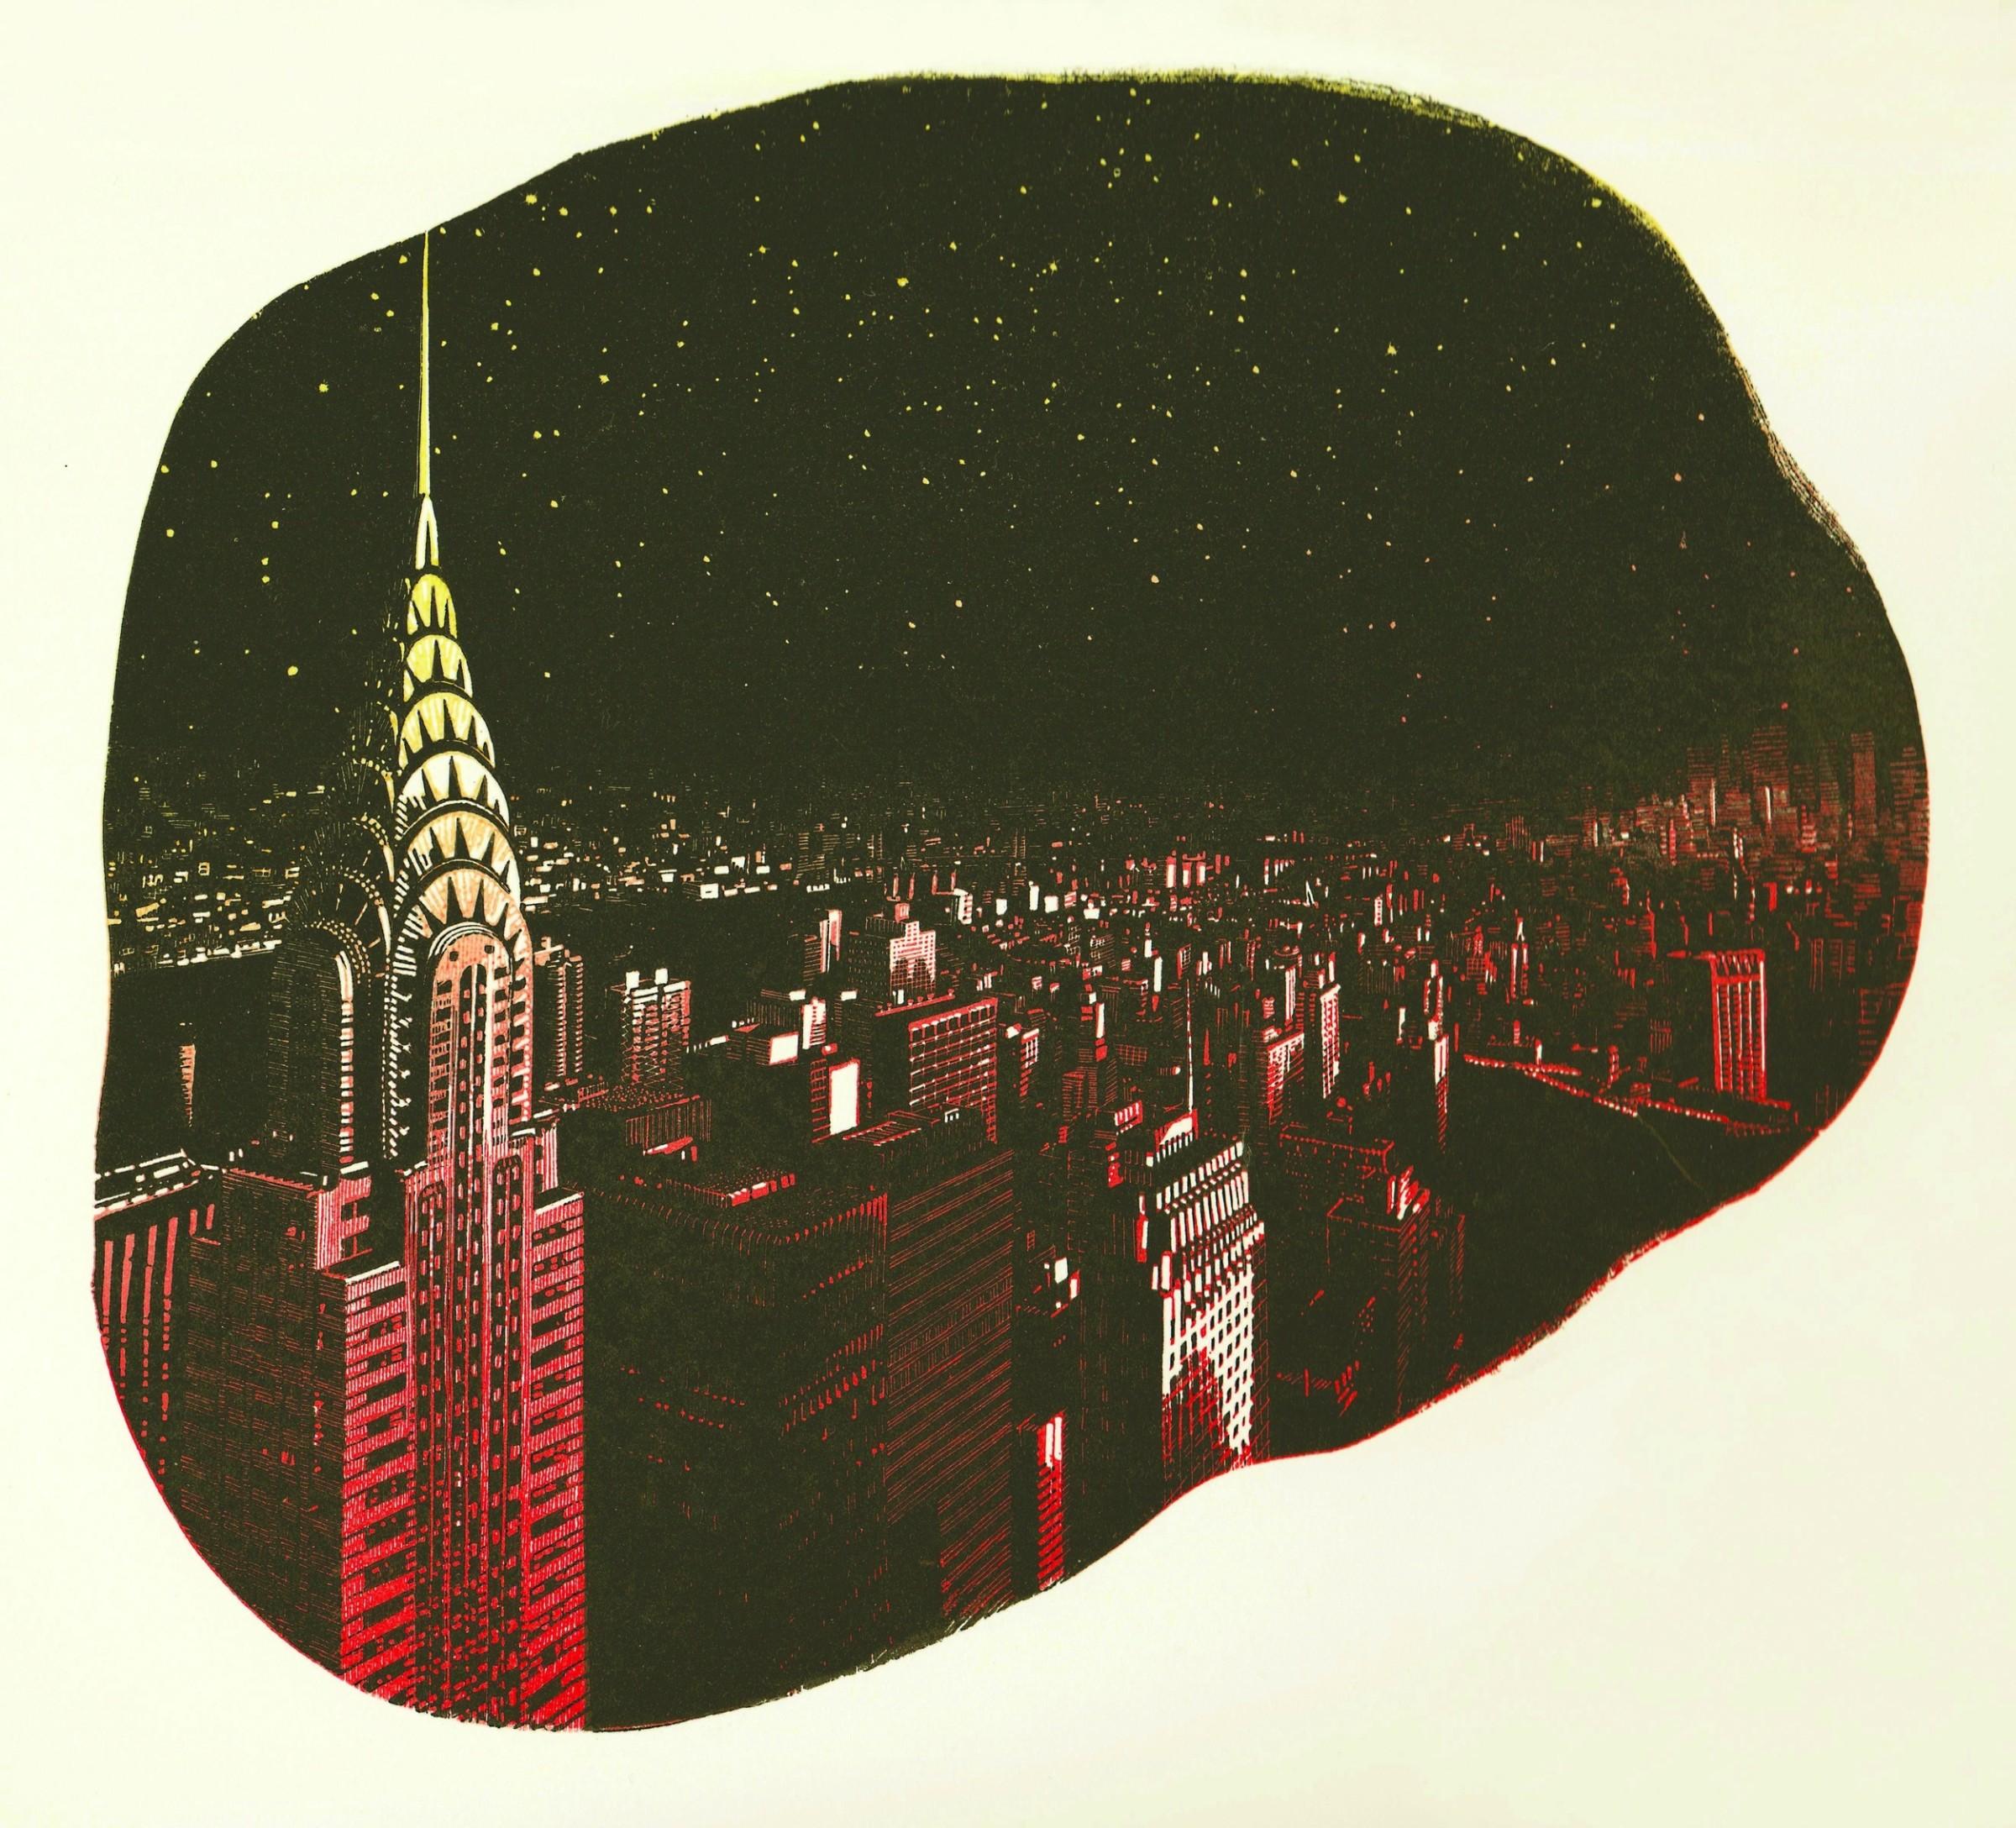 "<span class=""link fancybox-details-link""><a href=""/exhibitions/20/works/artworks_standalone10807/"">View Detail Page</a></span><div class=""artist""><span class=""artist""><strong>Anne Desmet RA RE</strong></span></div><div class=""title""><em>Manhattan Stars</em></div><div class=""medium"">reduction wood engraving<br></div><div class=""dimensions"">19 x 20.3 cm image size<br></div><div class=""edition_details"">edition of 20</div>"